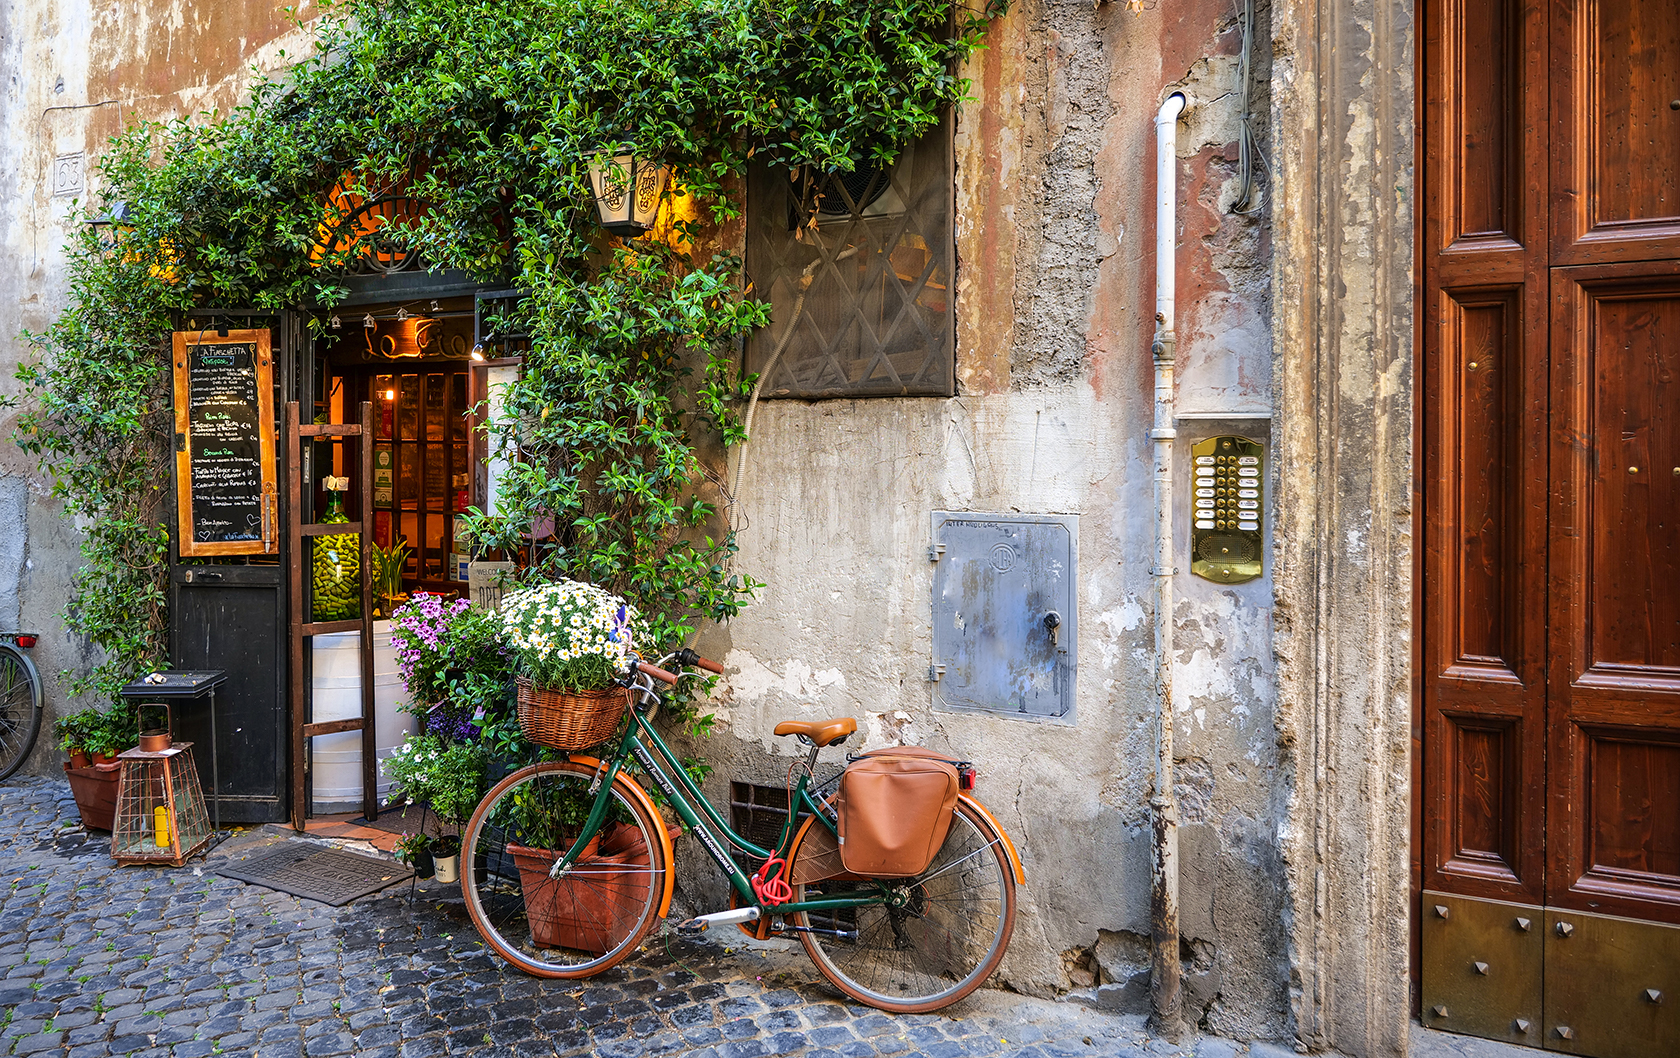 A Guide to Rome's Trastevere Neighborhood